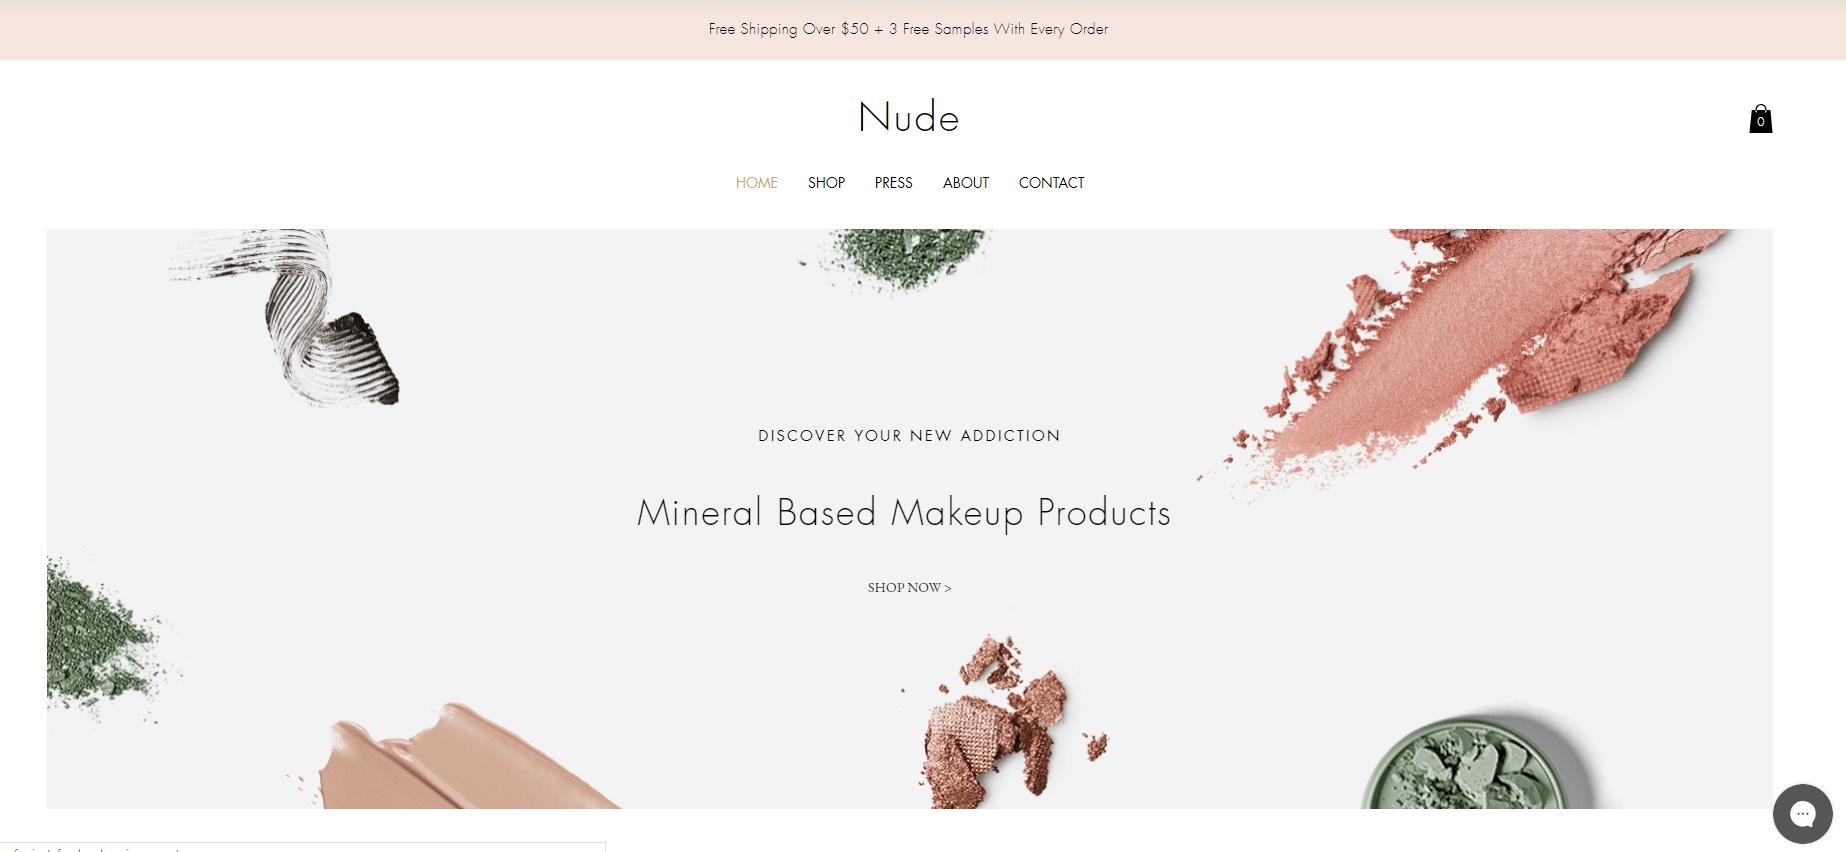 Sample of an online store website template